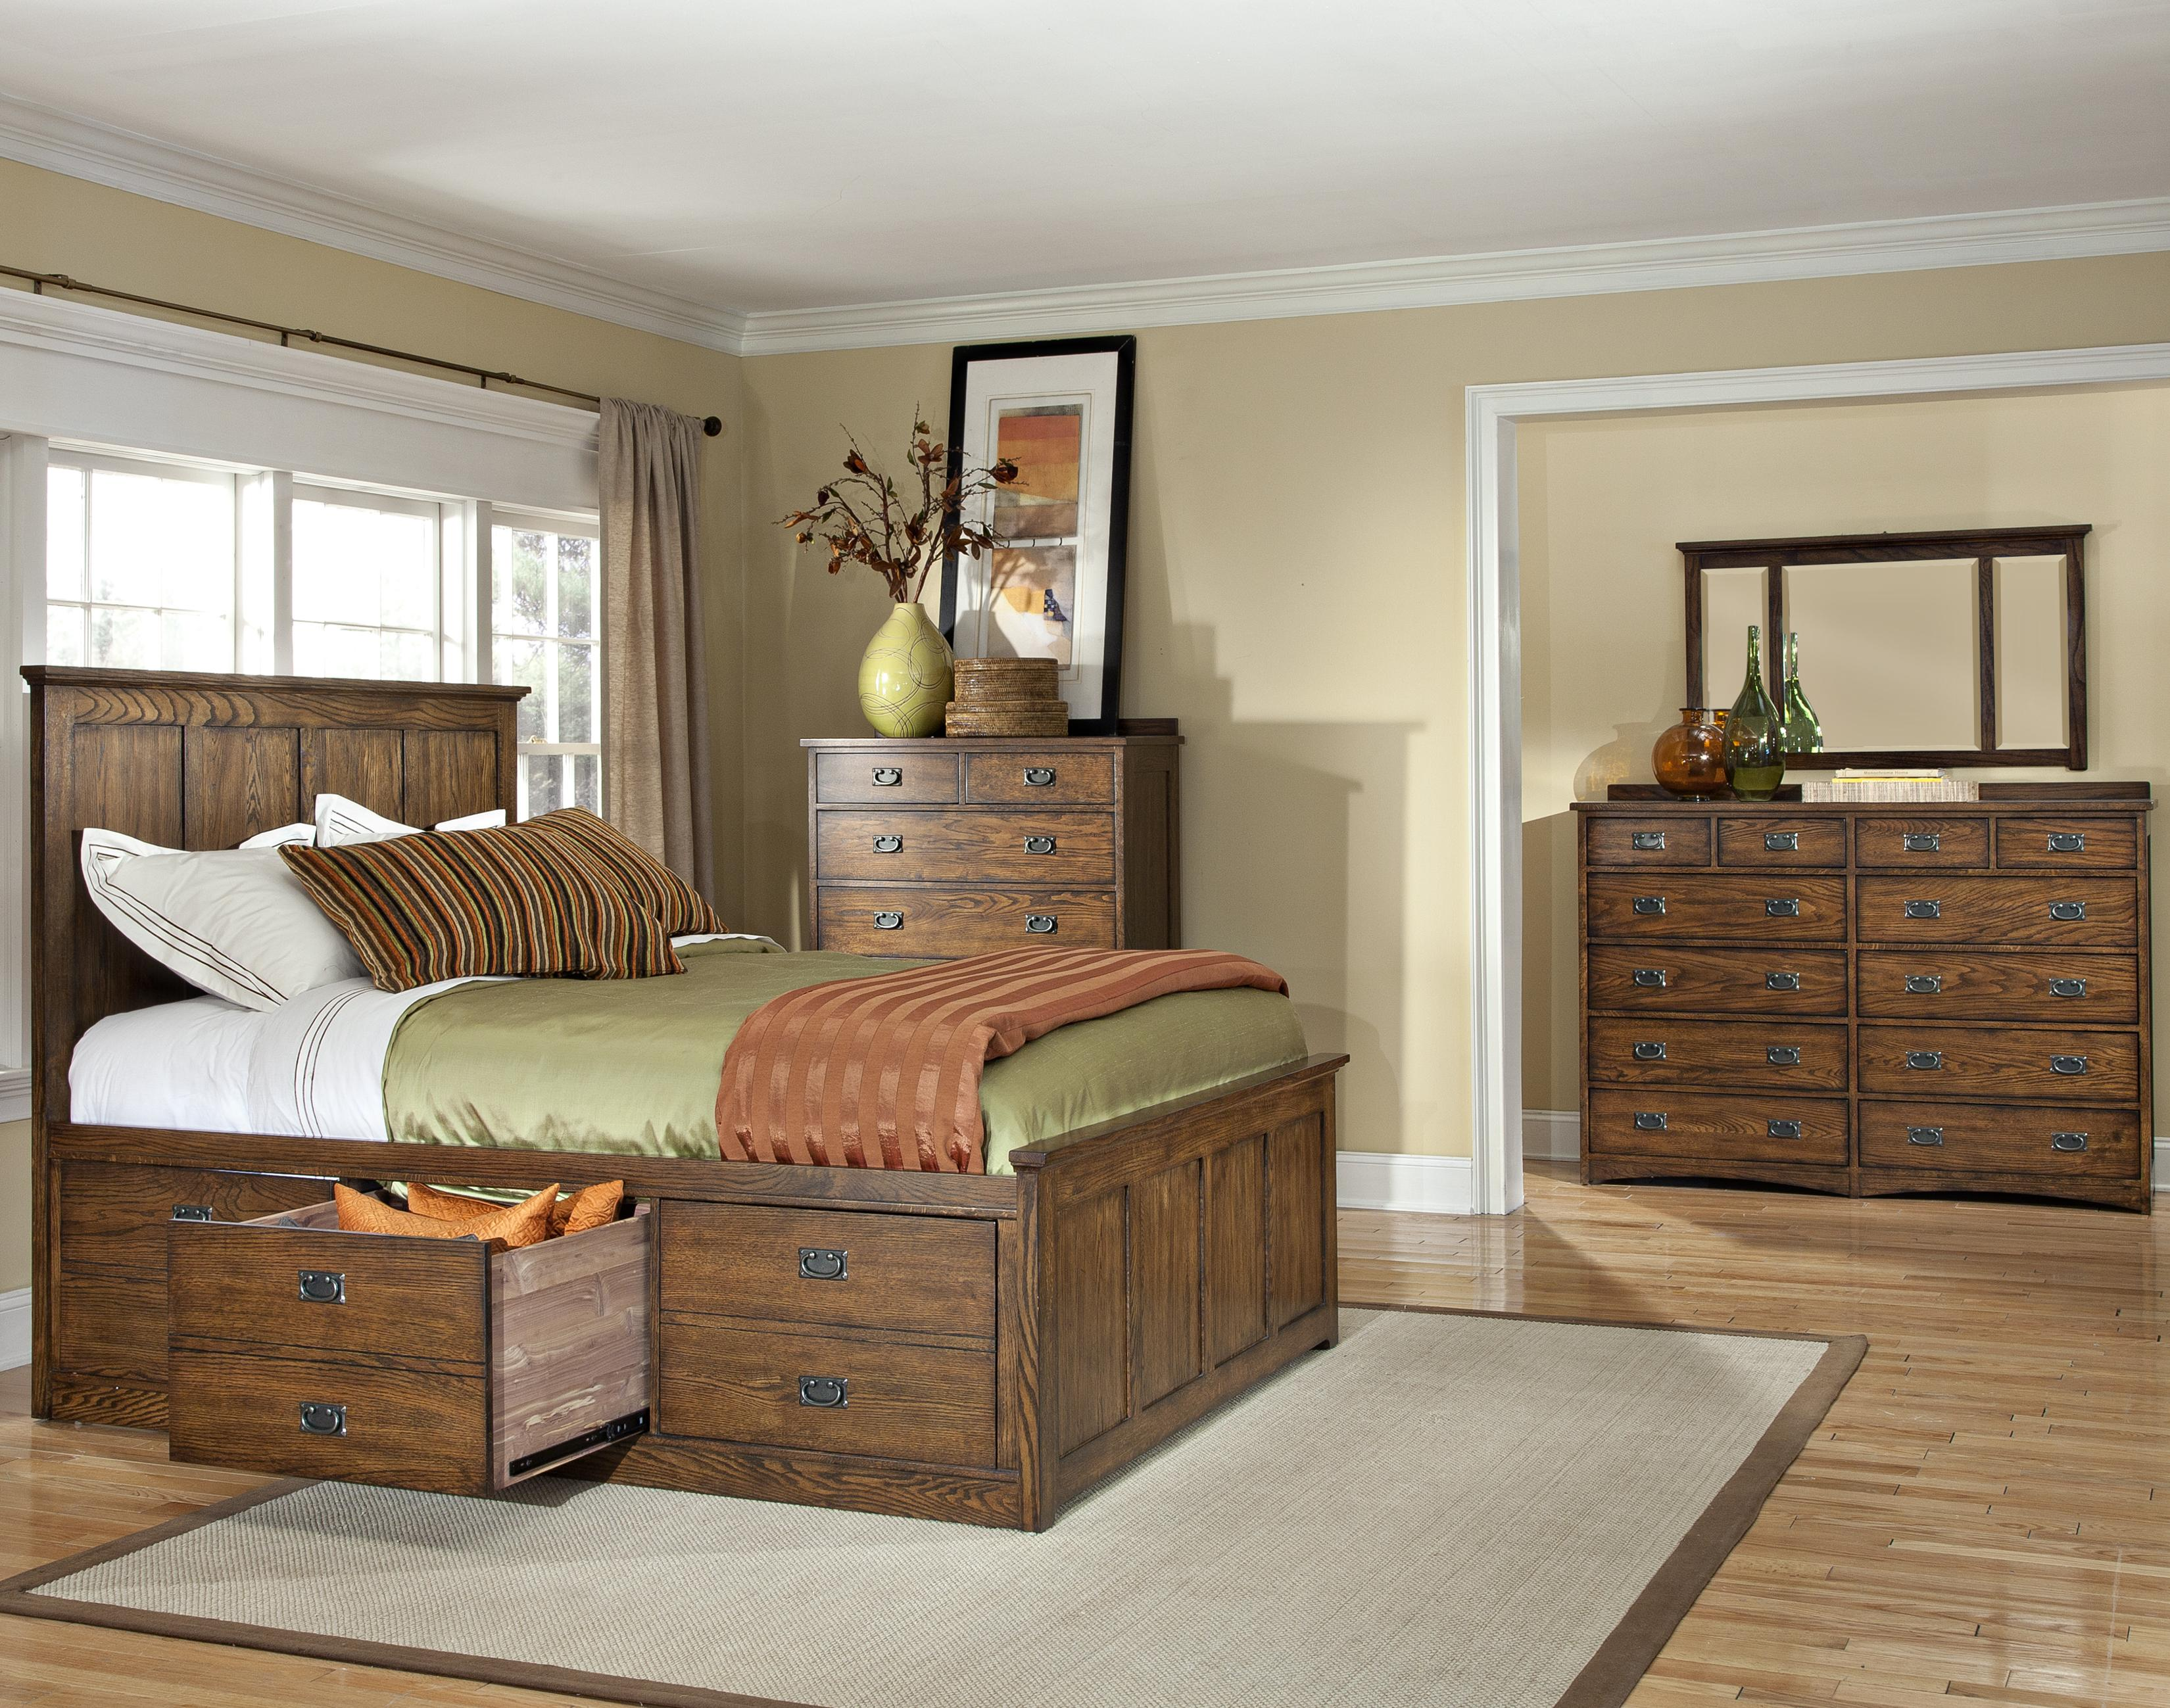 Oak Park Queen Bedroom Group by VFM Signature at Virginia Furniture Market